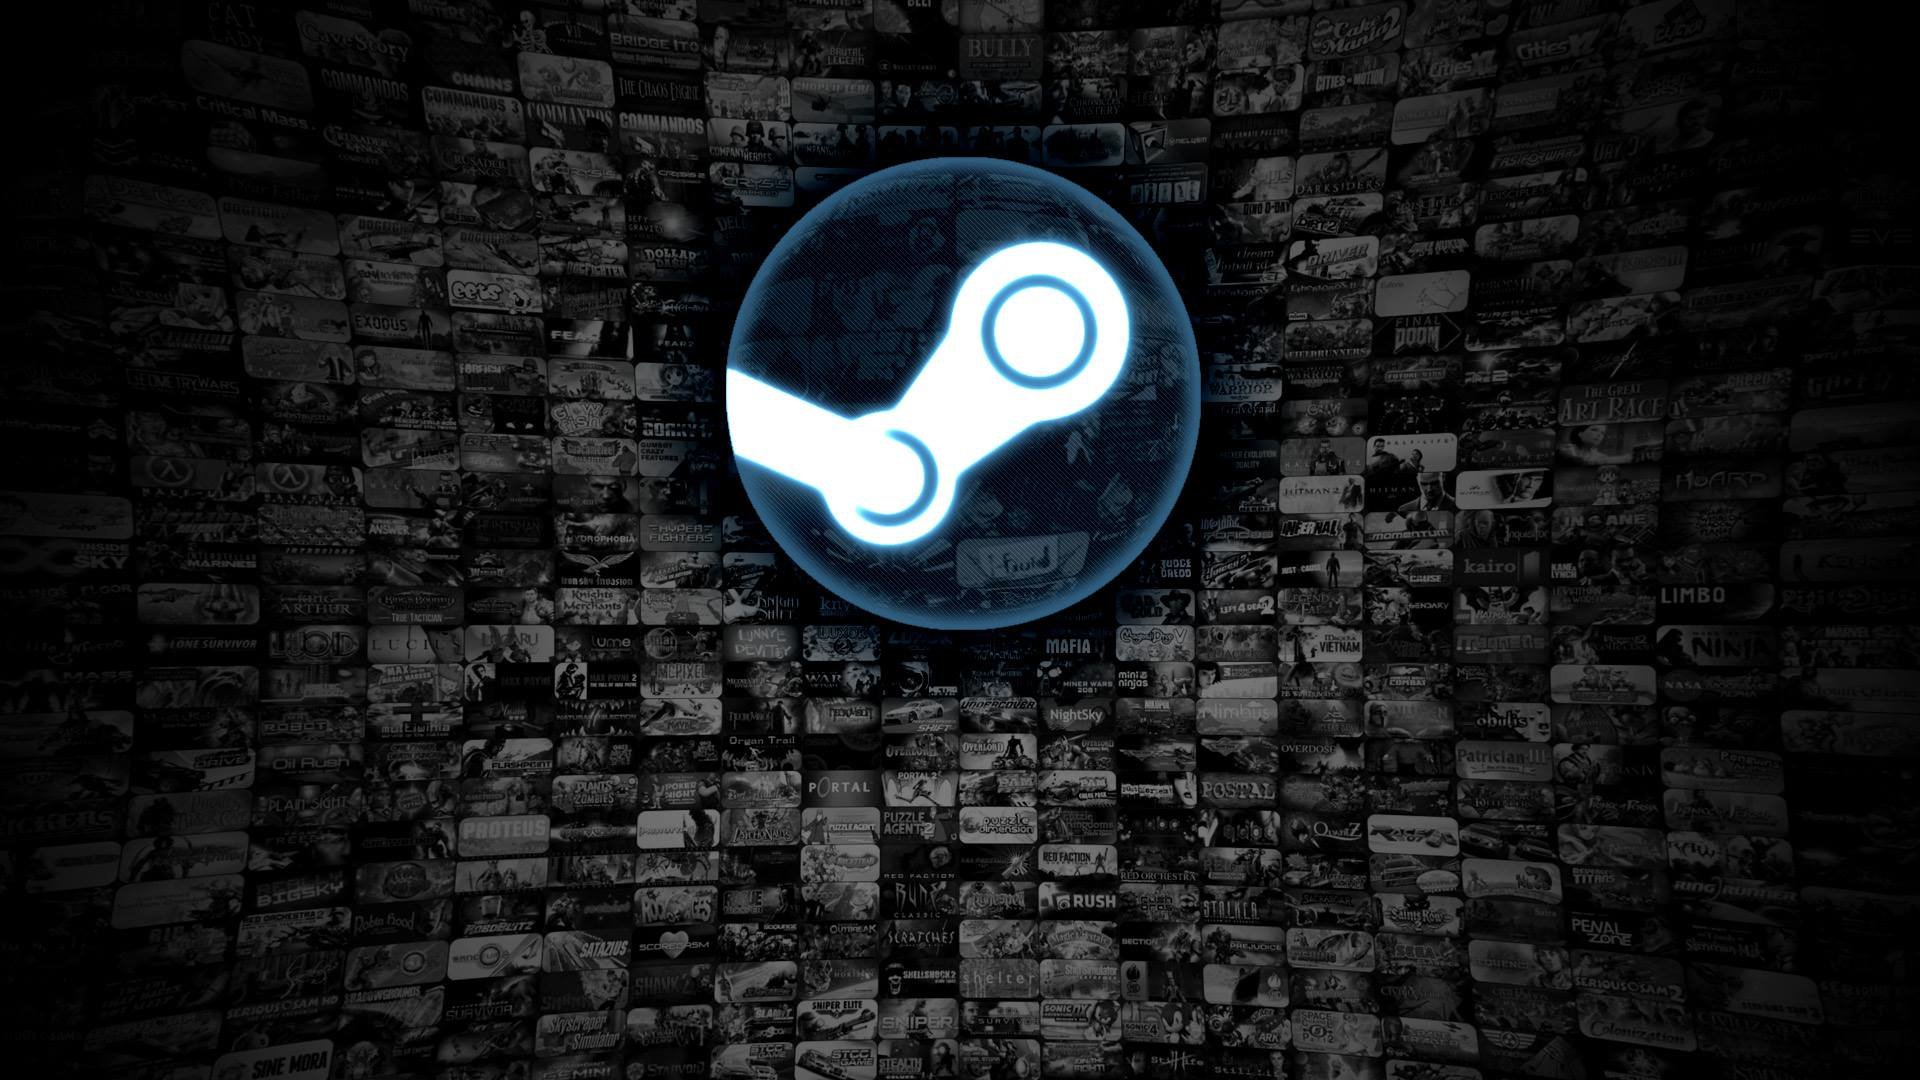 record: אילו משחקים נמכרו הכי הרבה בשנת 2017? cover image